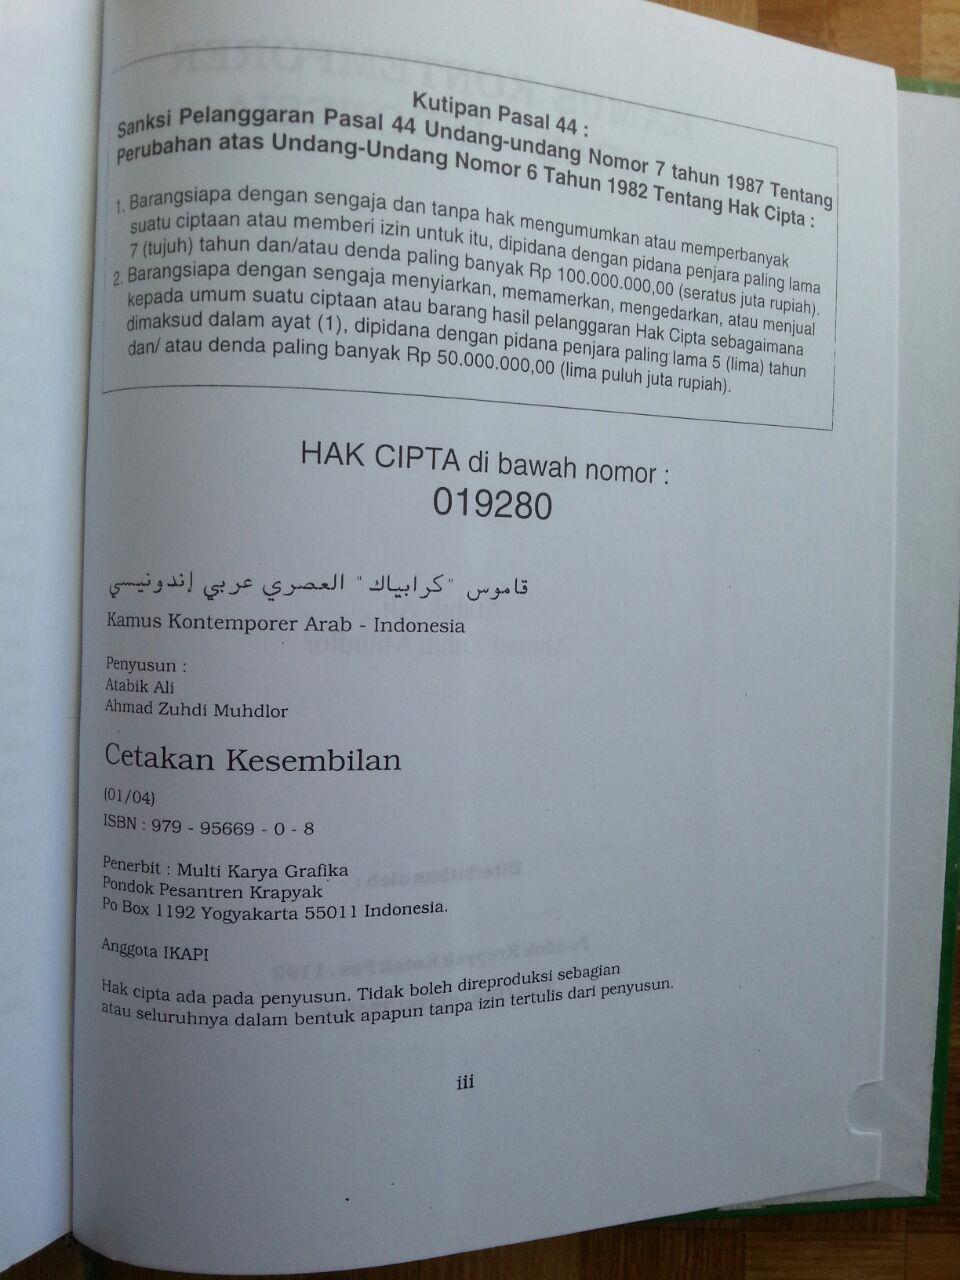 Kamus Al-'Ashri Kamus Kontemporer Arab Indonesia isi 3